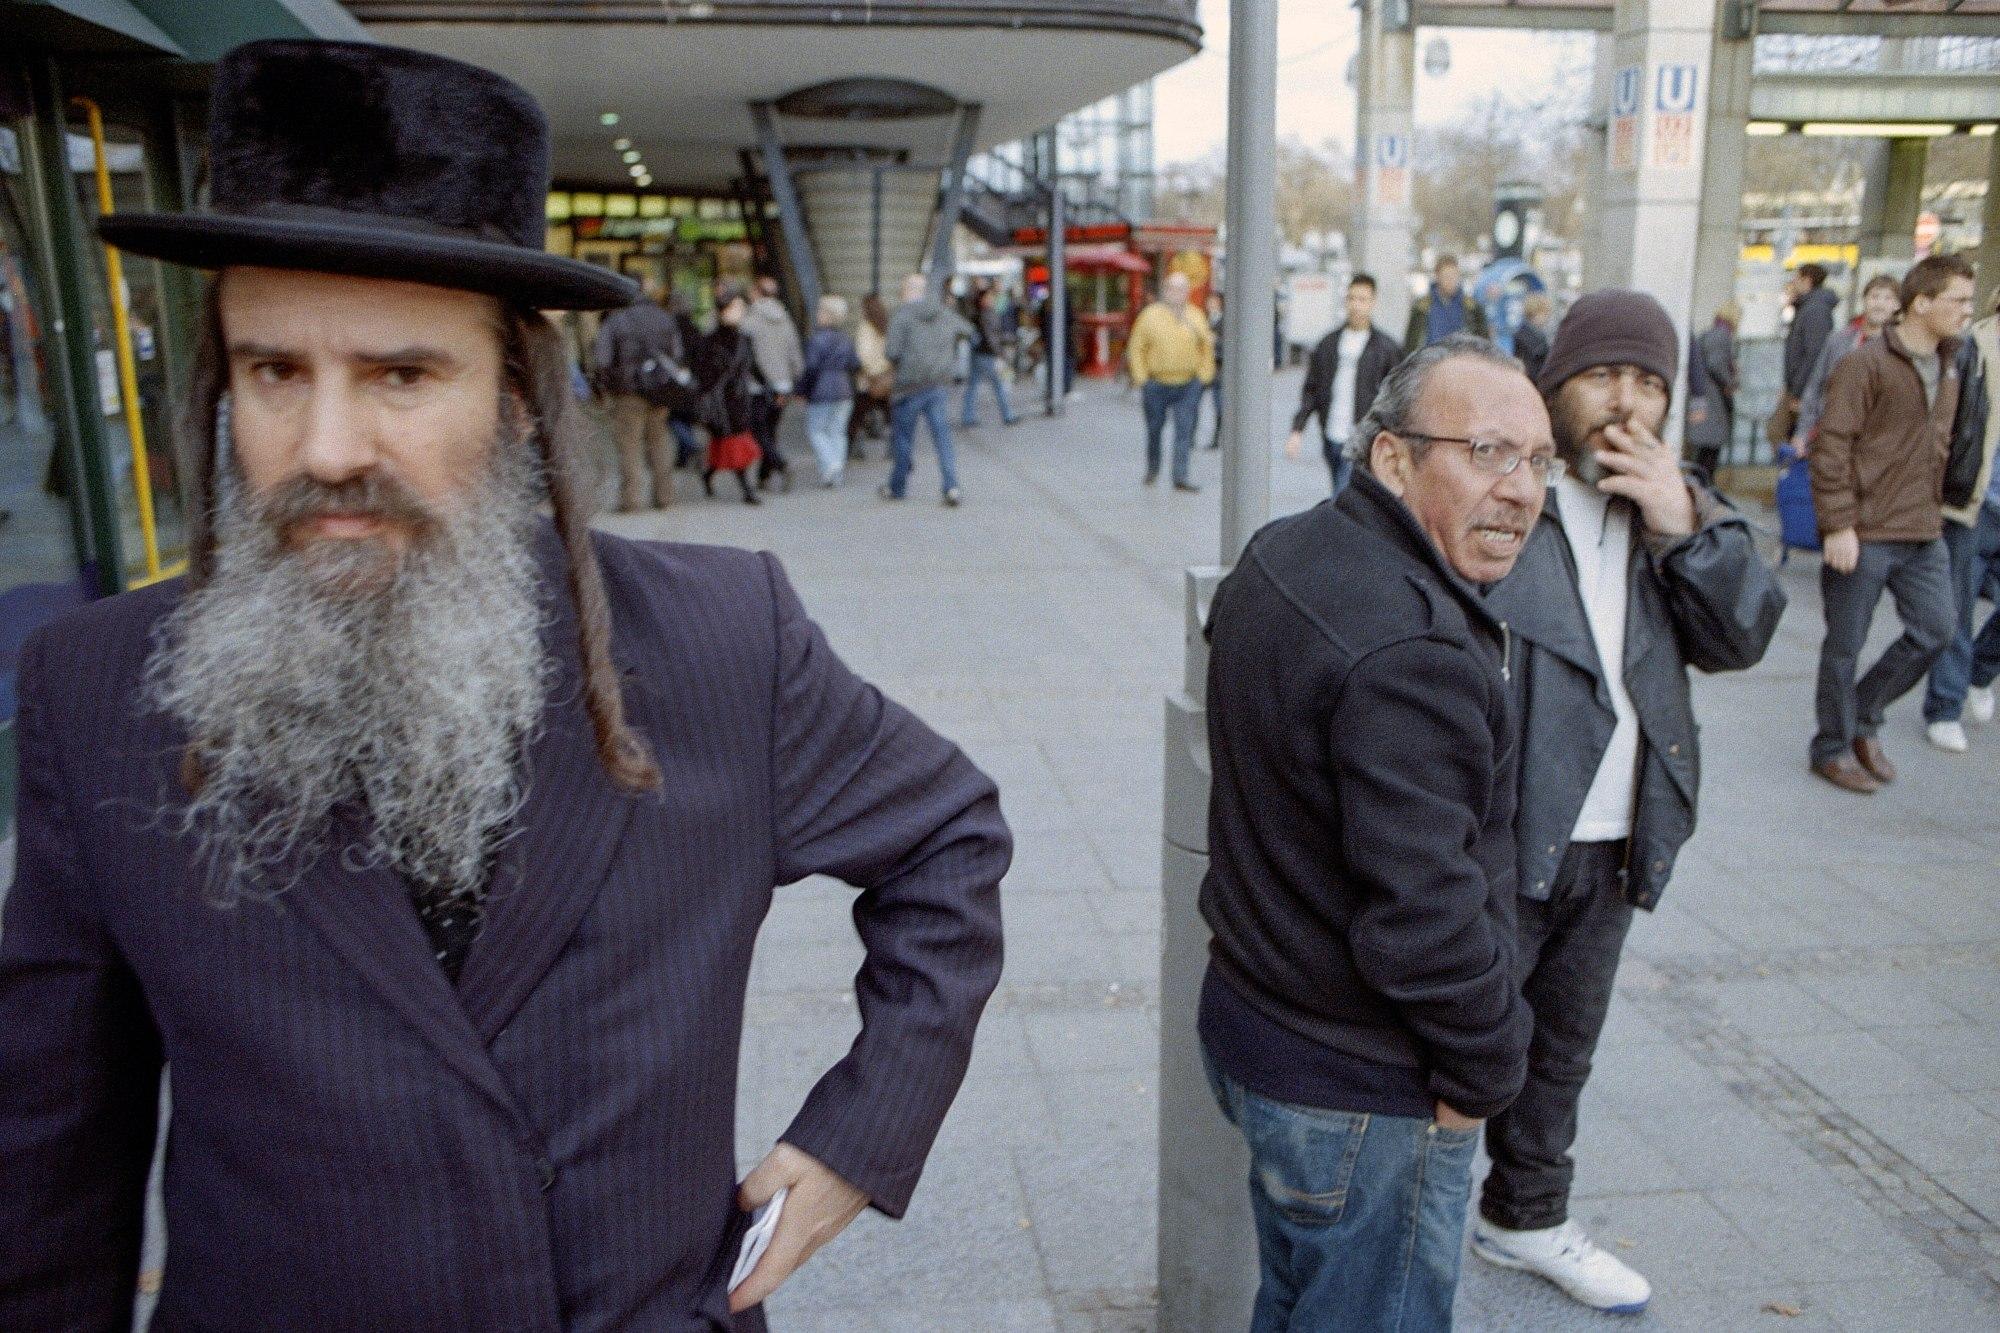 An orthodox Jew at Bahnhof Zoo, Berlin. Photo by Holger Biermann.